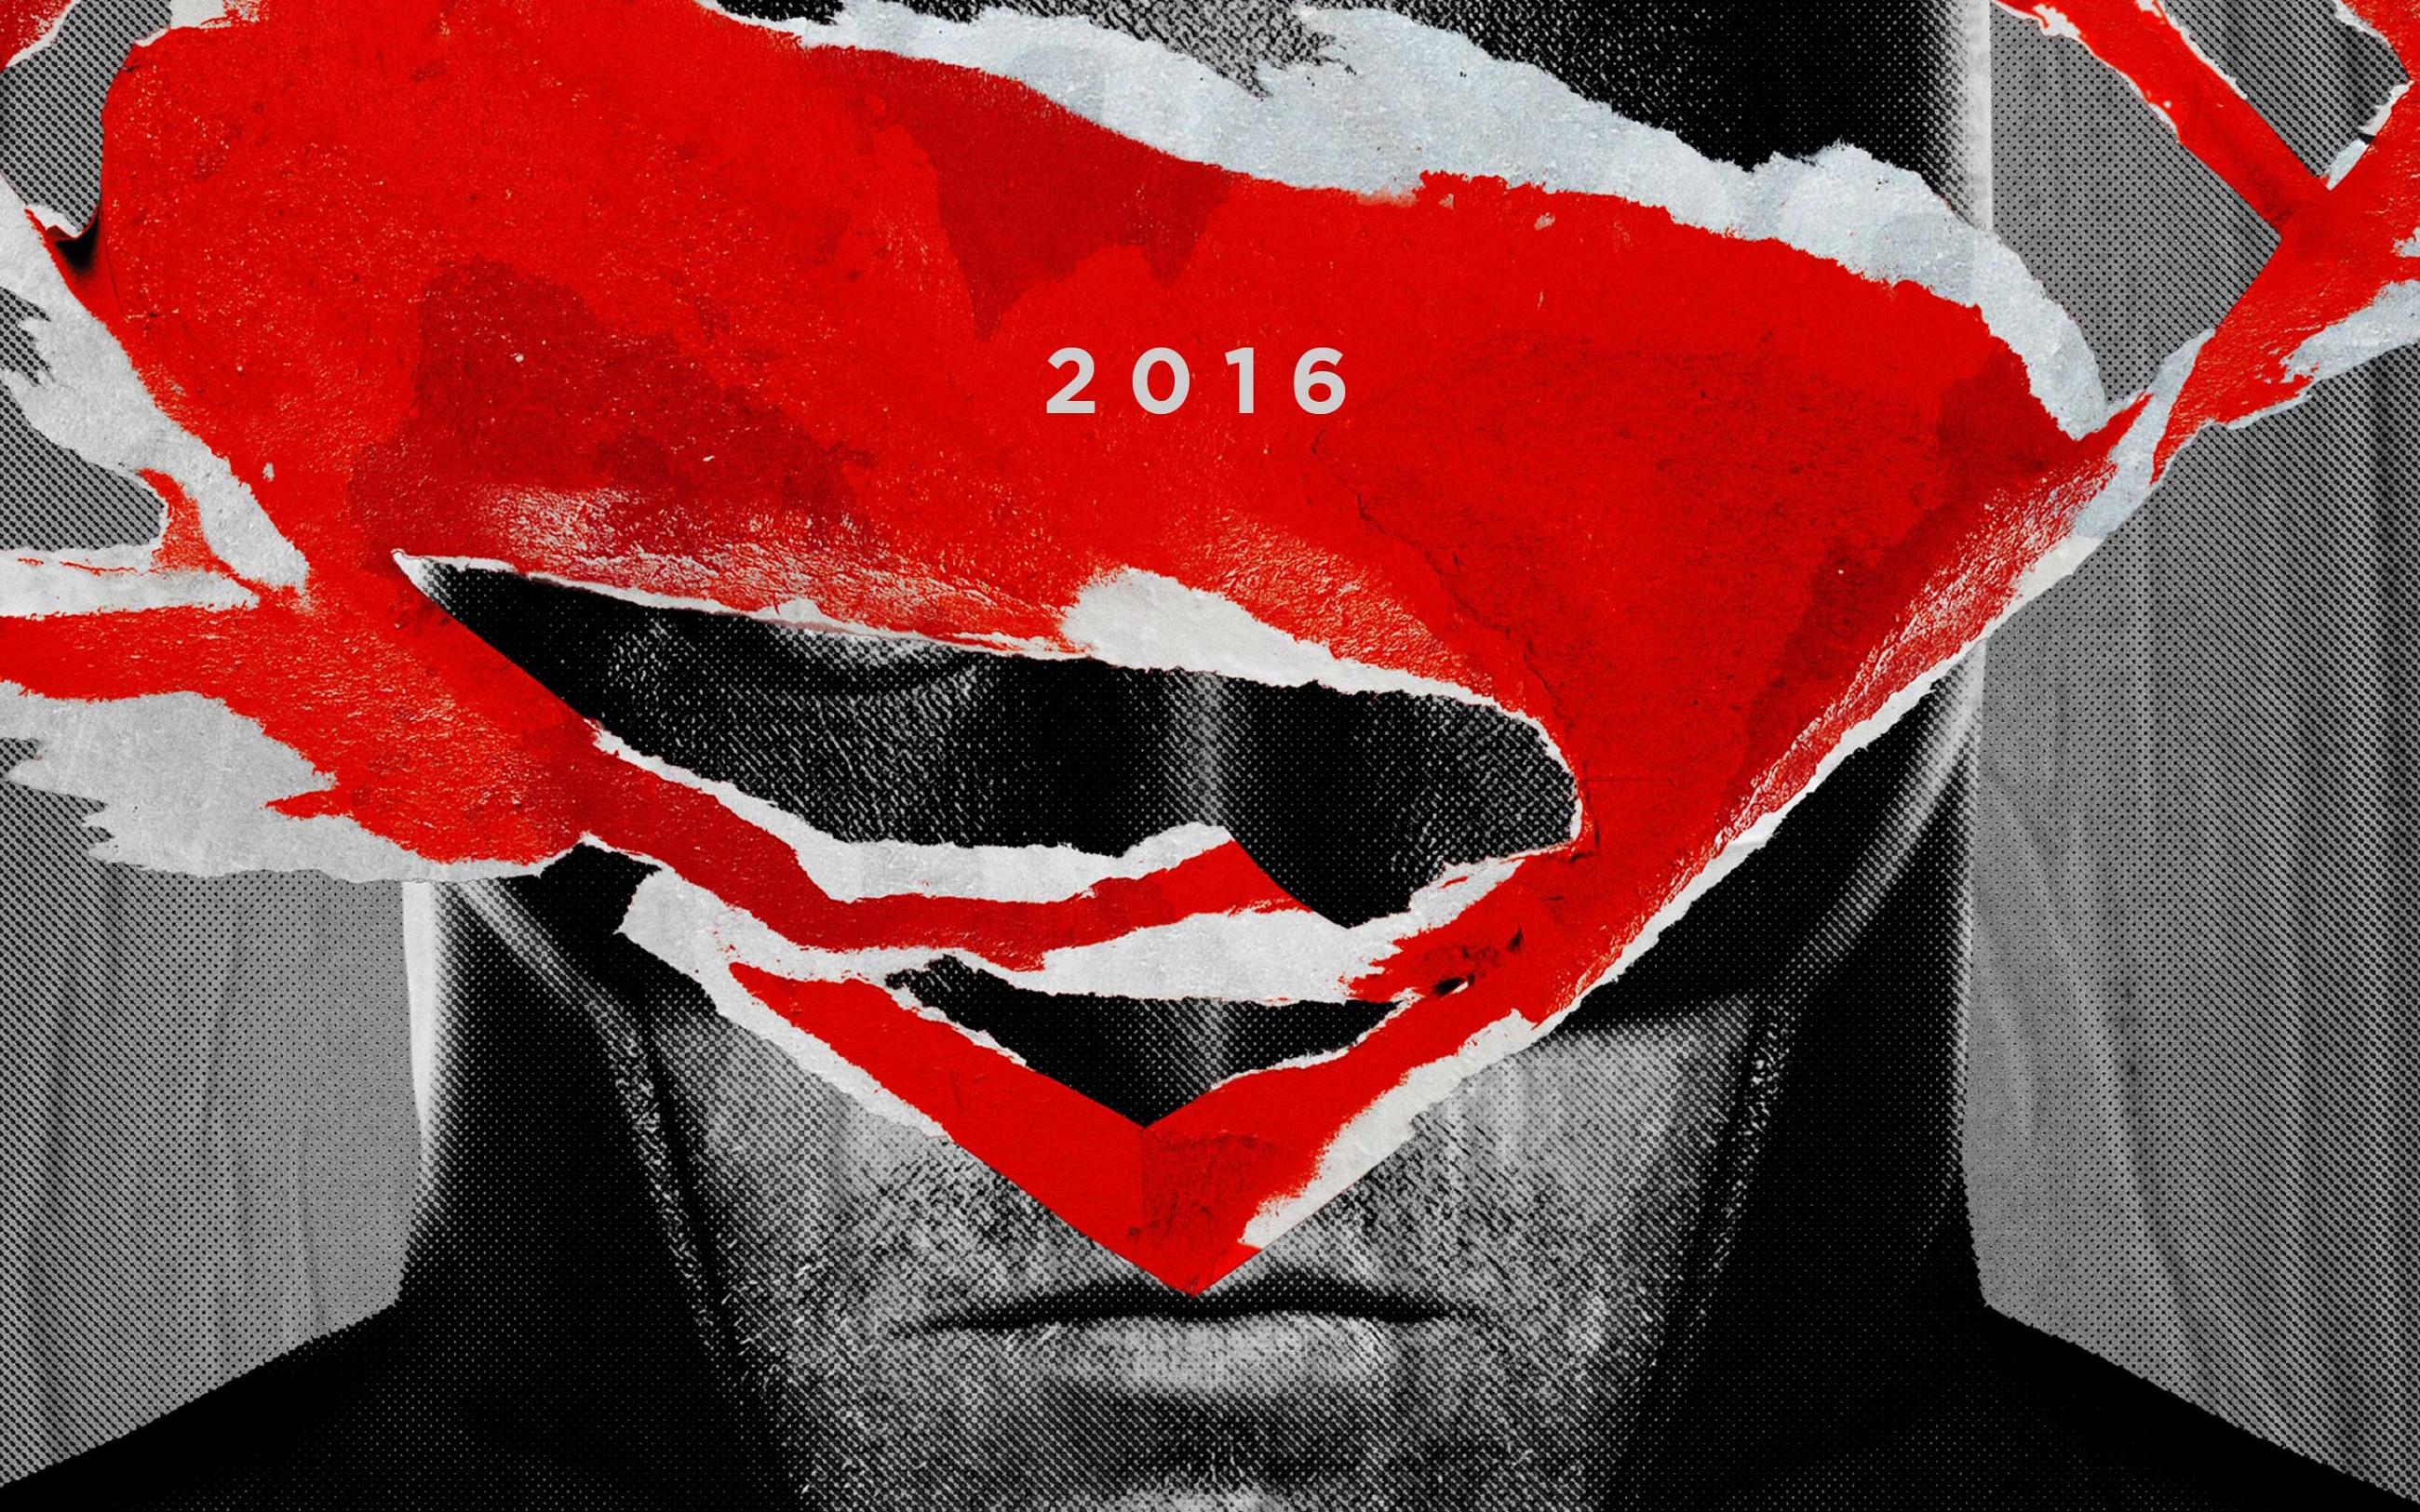 640x960 Batman Vs Superman Hd Wallpapers Iphone 4 Iphone 4s